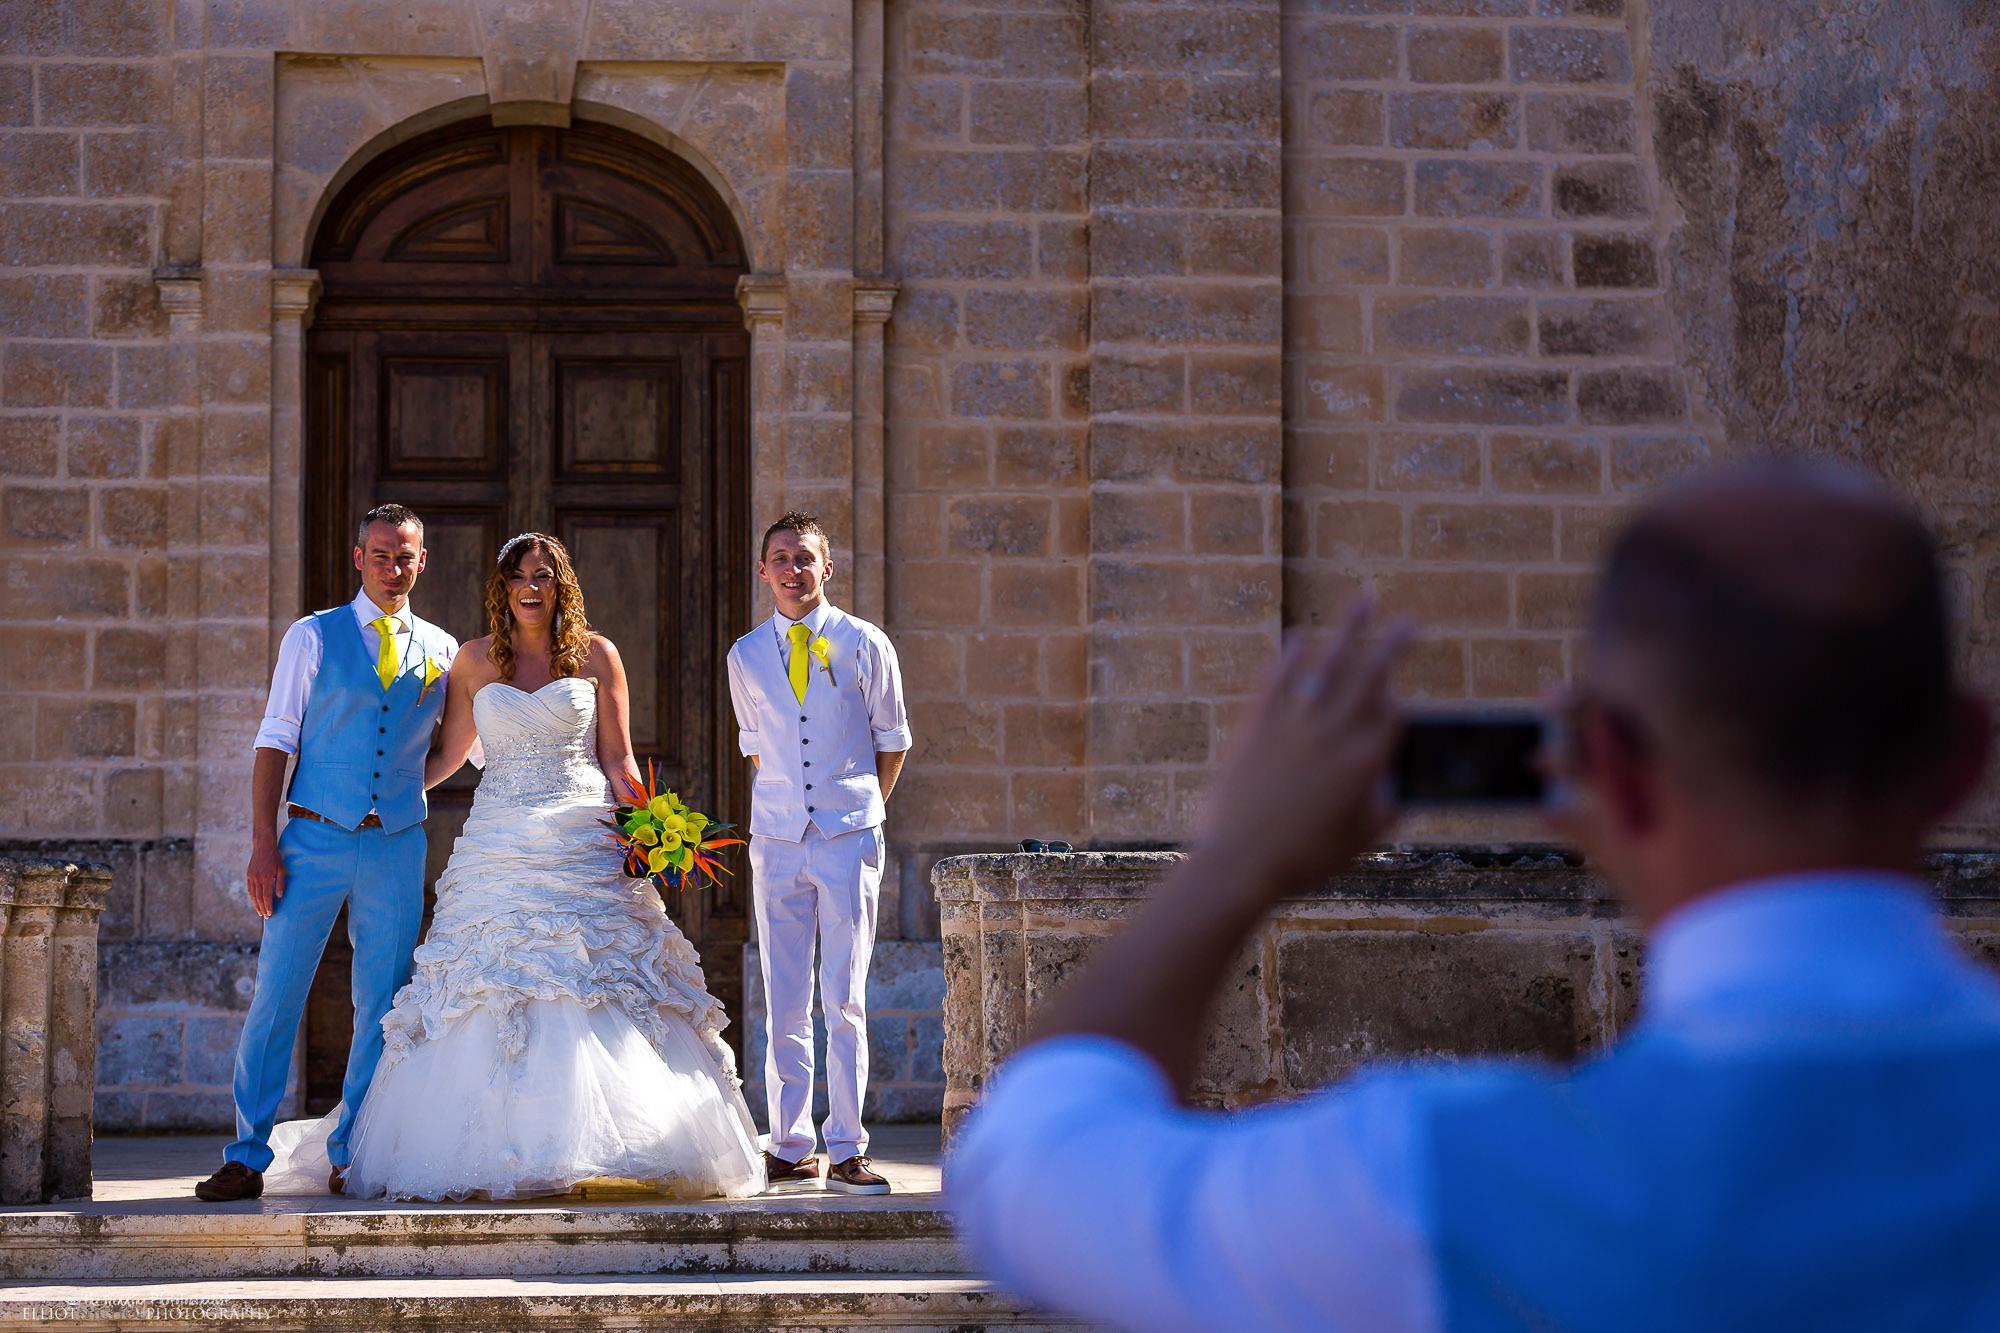 photo-wedding-guests-bride-groom-portrait